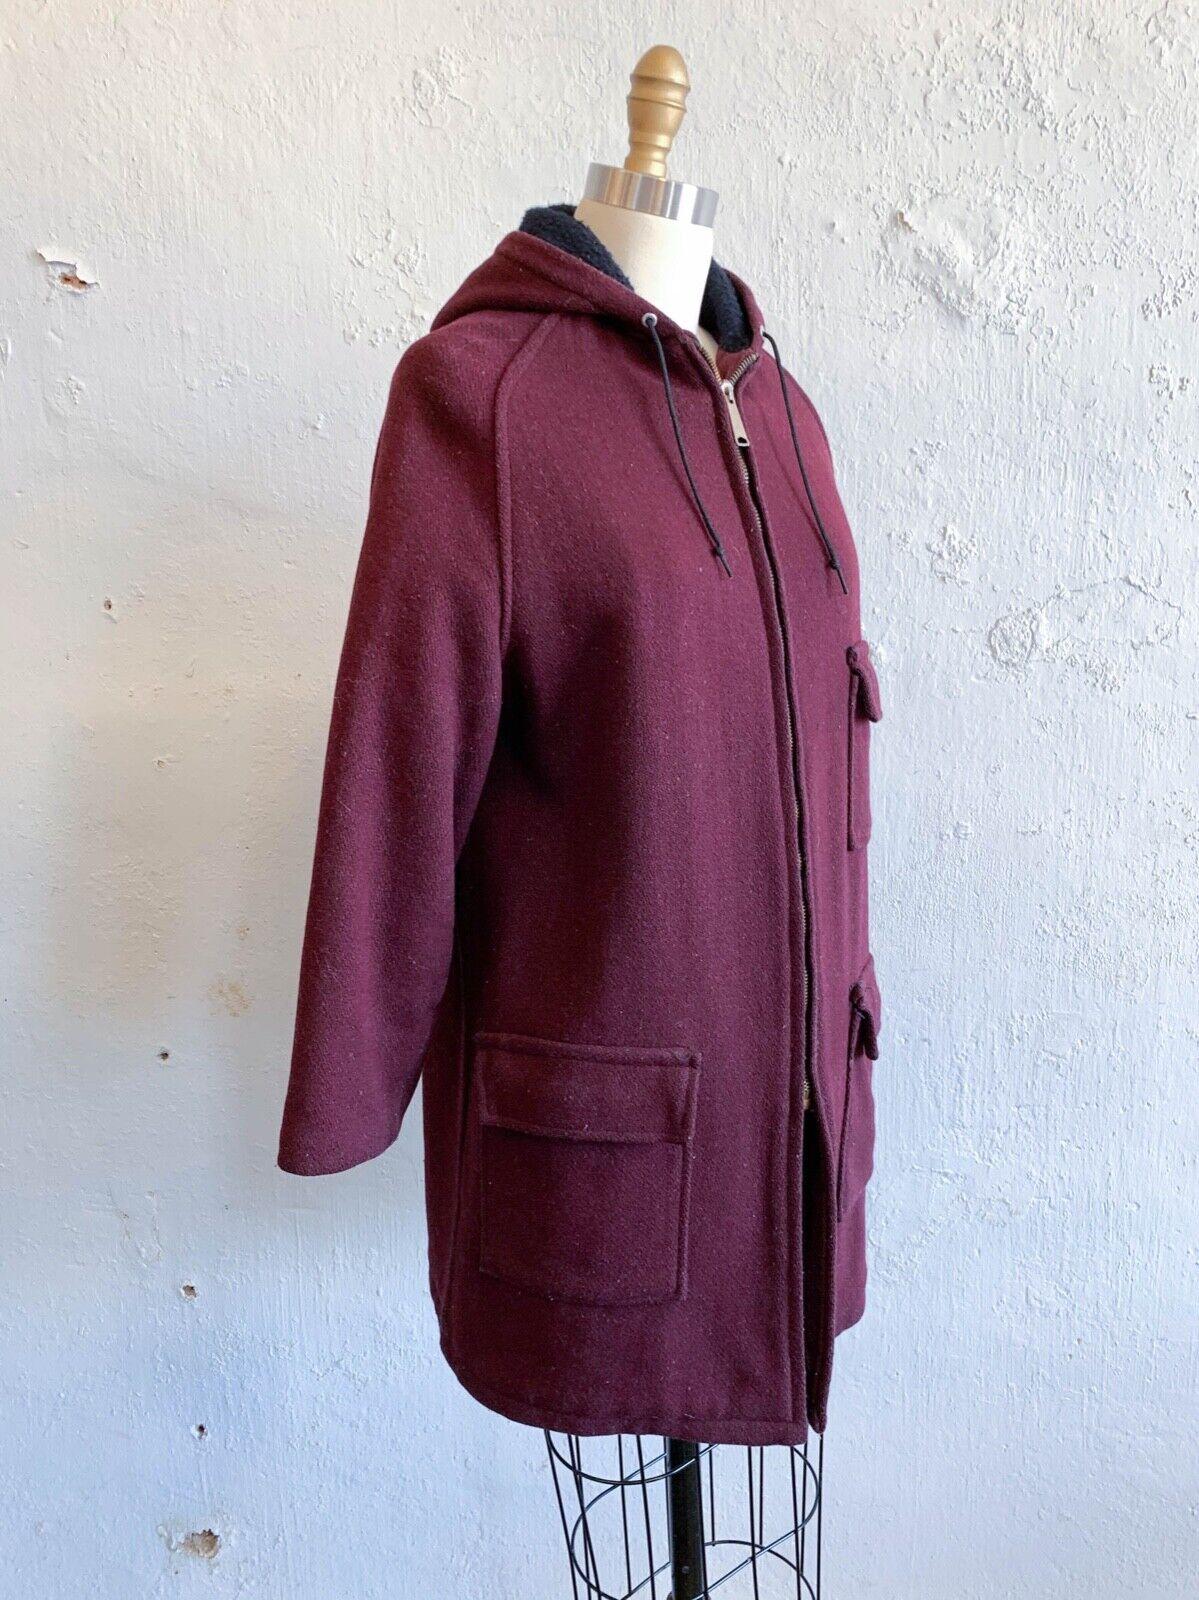 Vtg 60s Wool Jacket Full Zip Hooded Dark Red Fleece Lined Barb Coat Wms Small